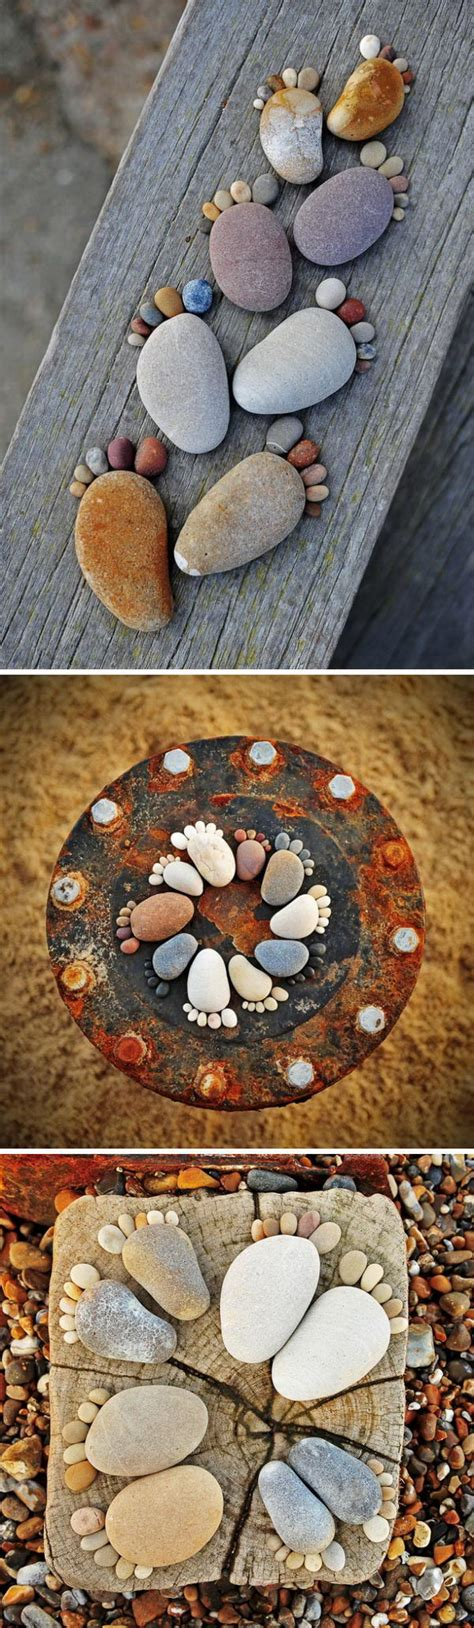 diy pebbles rocks river decor using stone footprints